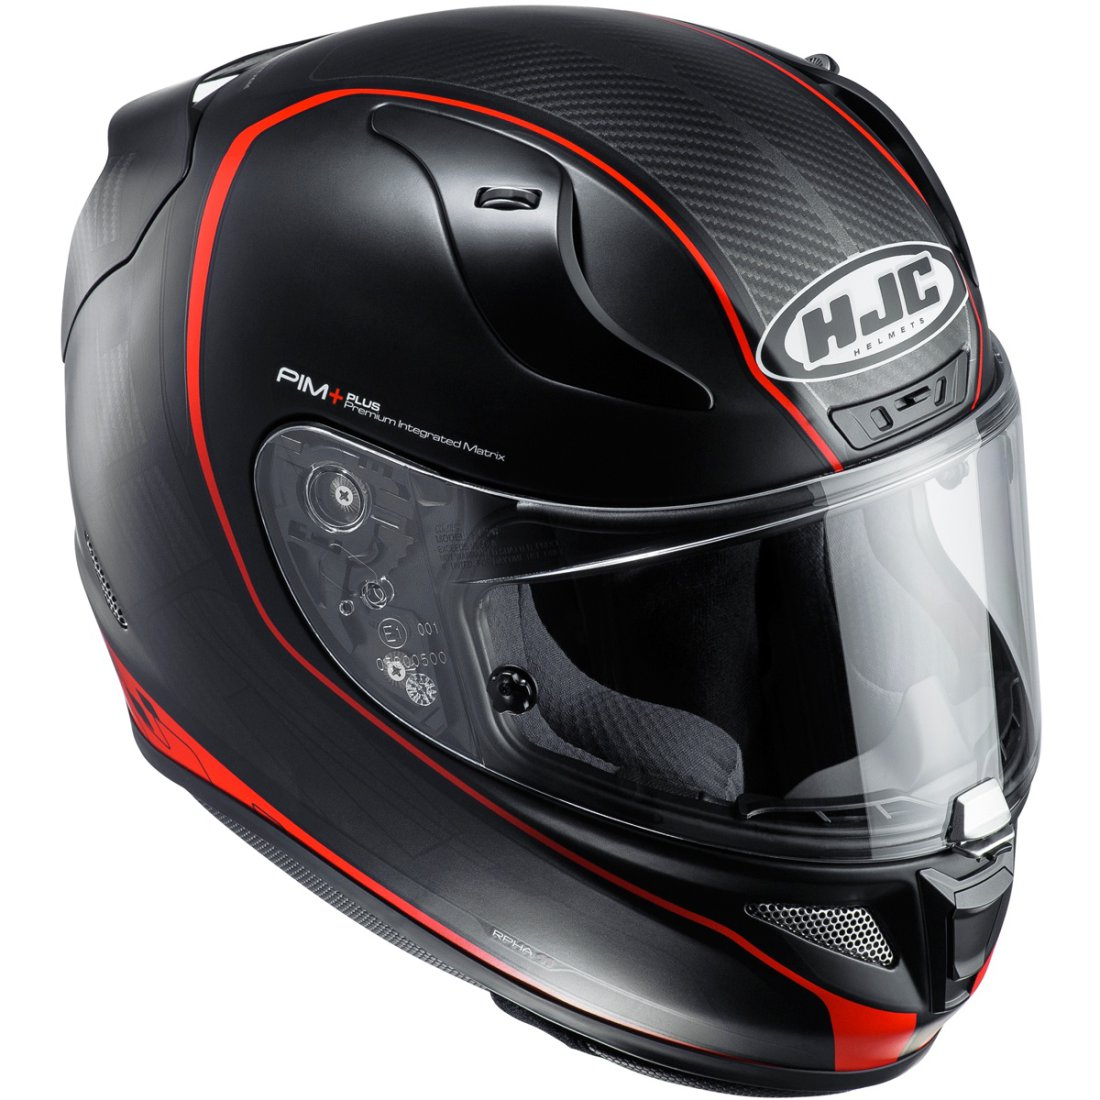 hjc rpha 11 riberte mc 1sf helmet motocard. Black Bedroom Furniture Sets. Home Design Ideas